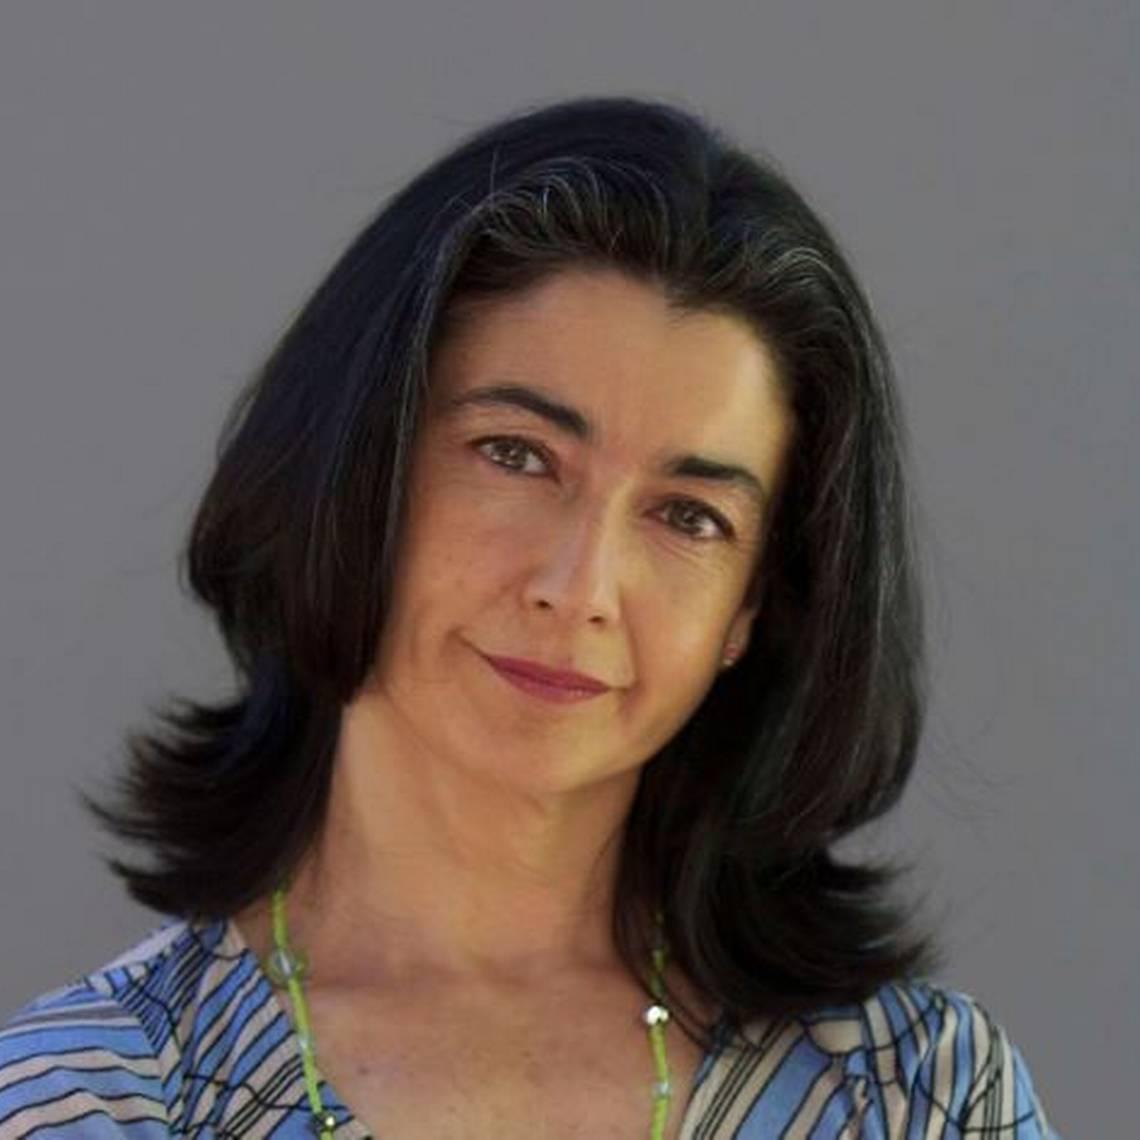 ¡Bienvenida! Paulina Urrutia se suma a la nueva nocturna de TVN